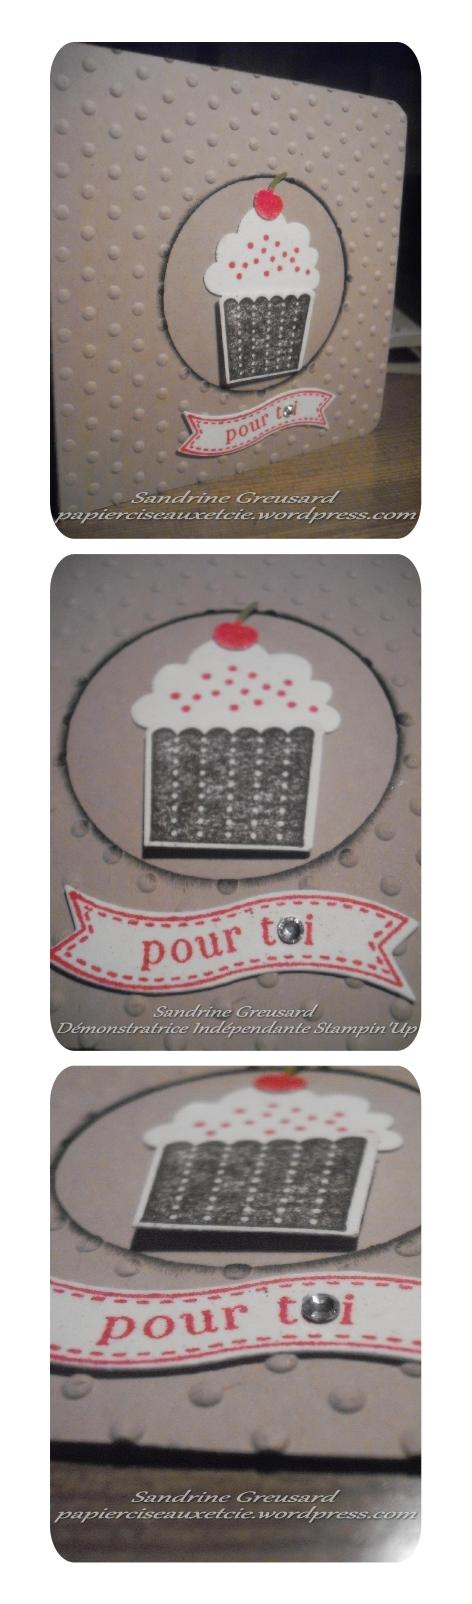 carte cupcake 2 Sandrine Greusard Démonstratrice Indépendante Stampin'Up